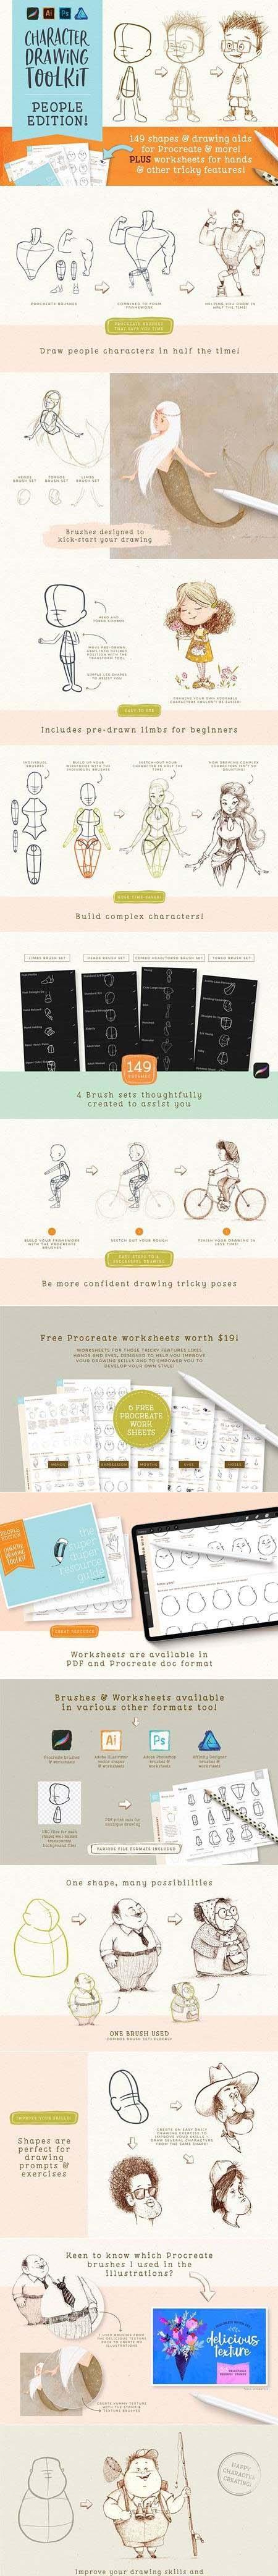 procreate people drawing toolkit copy brushespack